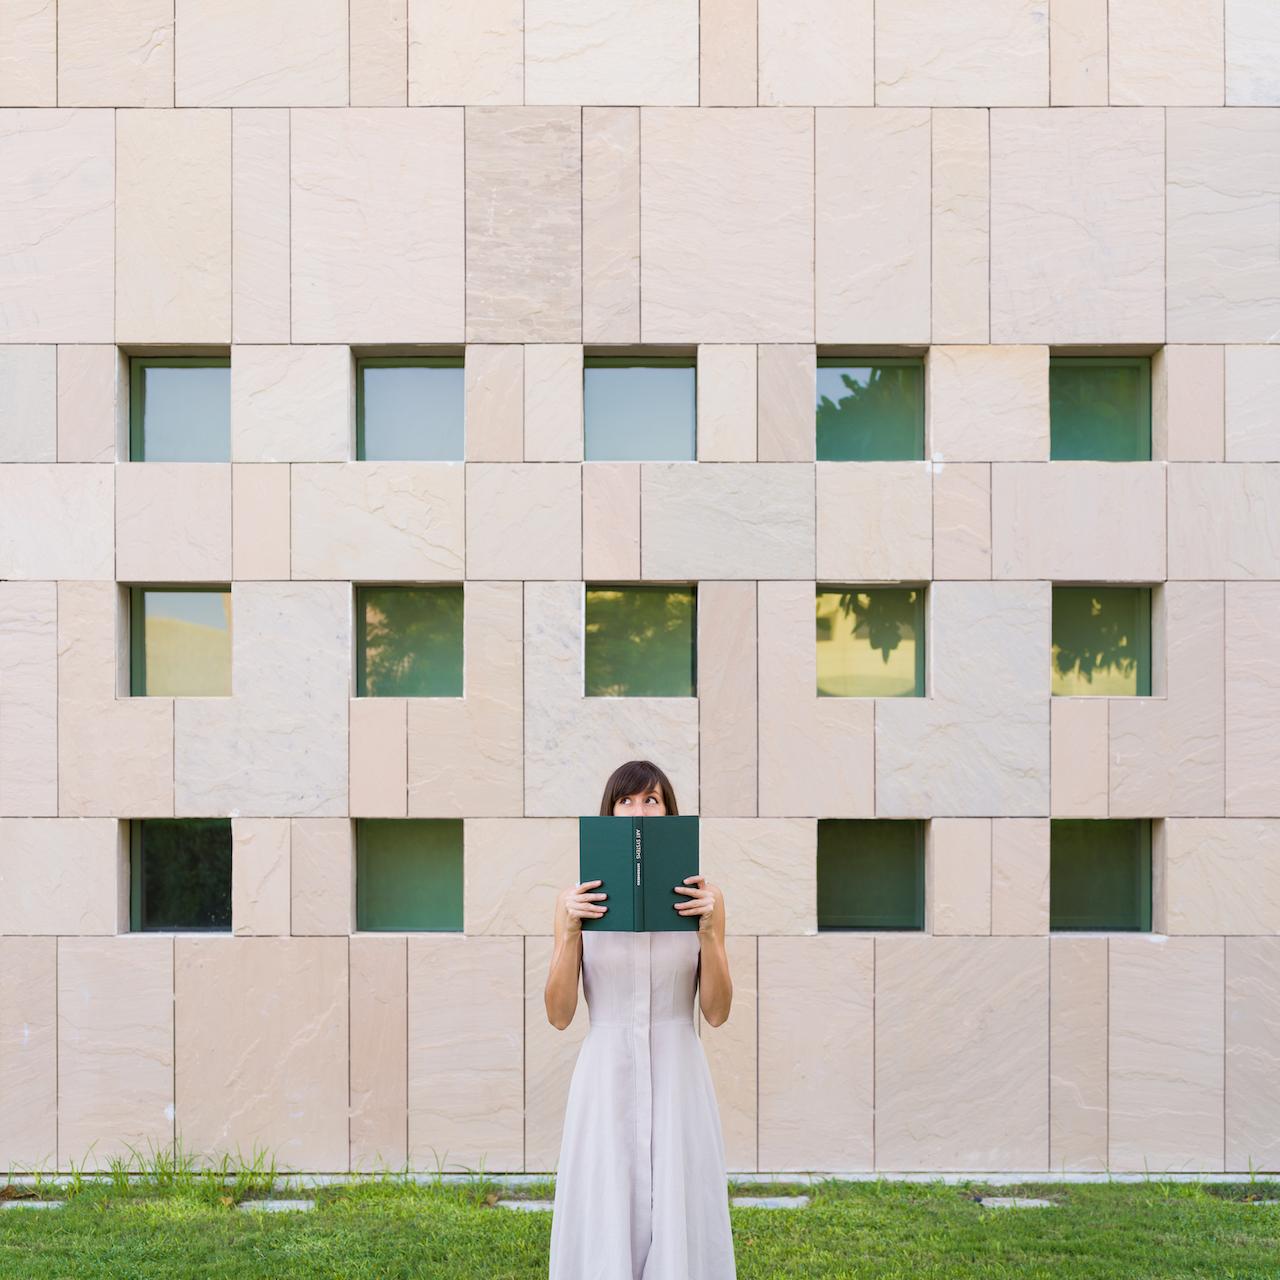 Annandaniel Anniset DrCuerda Anna Devís Daniel Rueda Happytecture Creative Minimal Surreal Fine Art Architecture Photography Happytecture Book Windows Multaqa Qatar Doha City Education